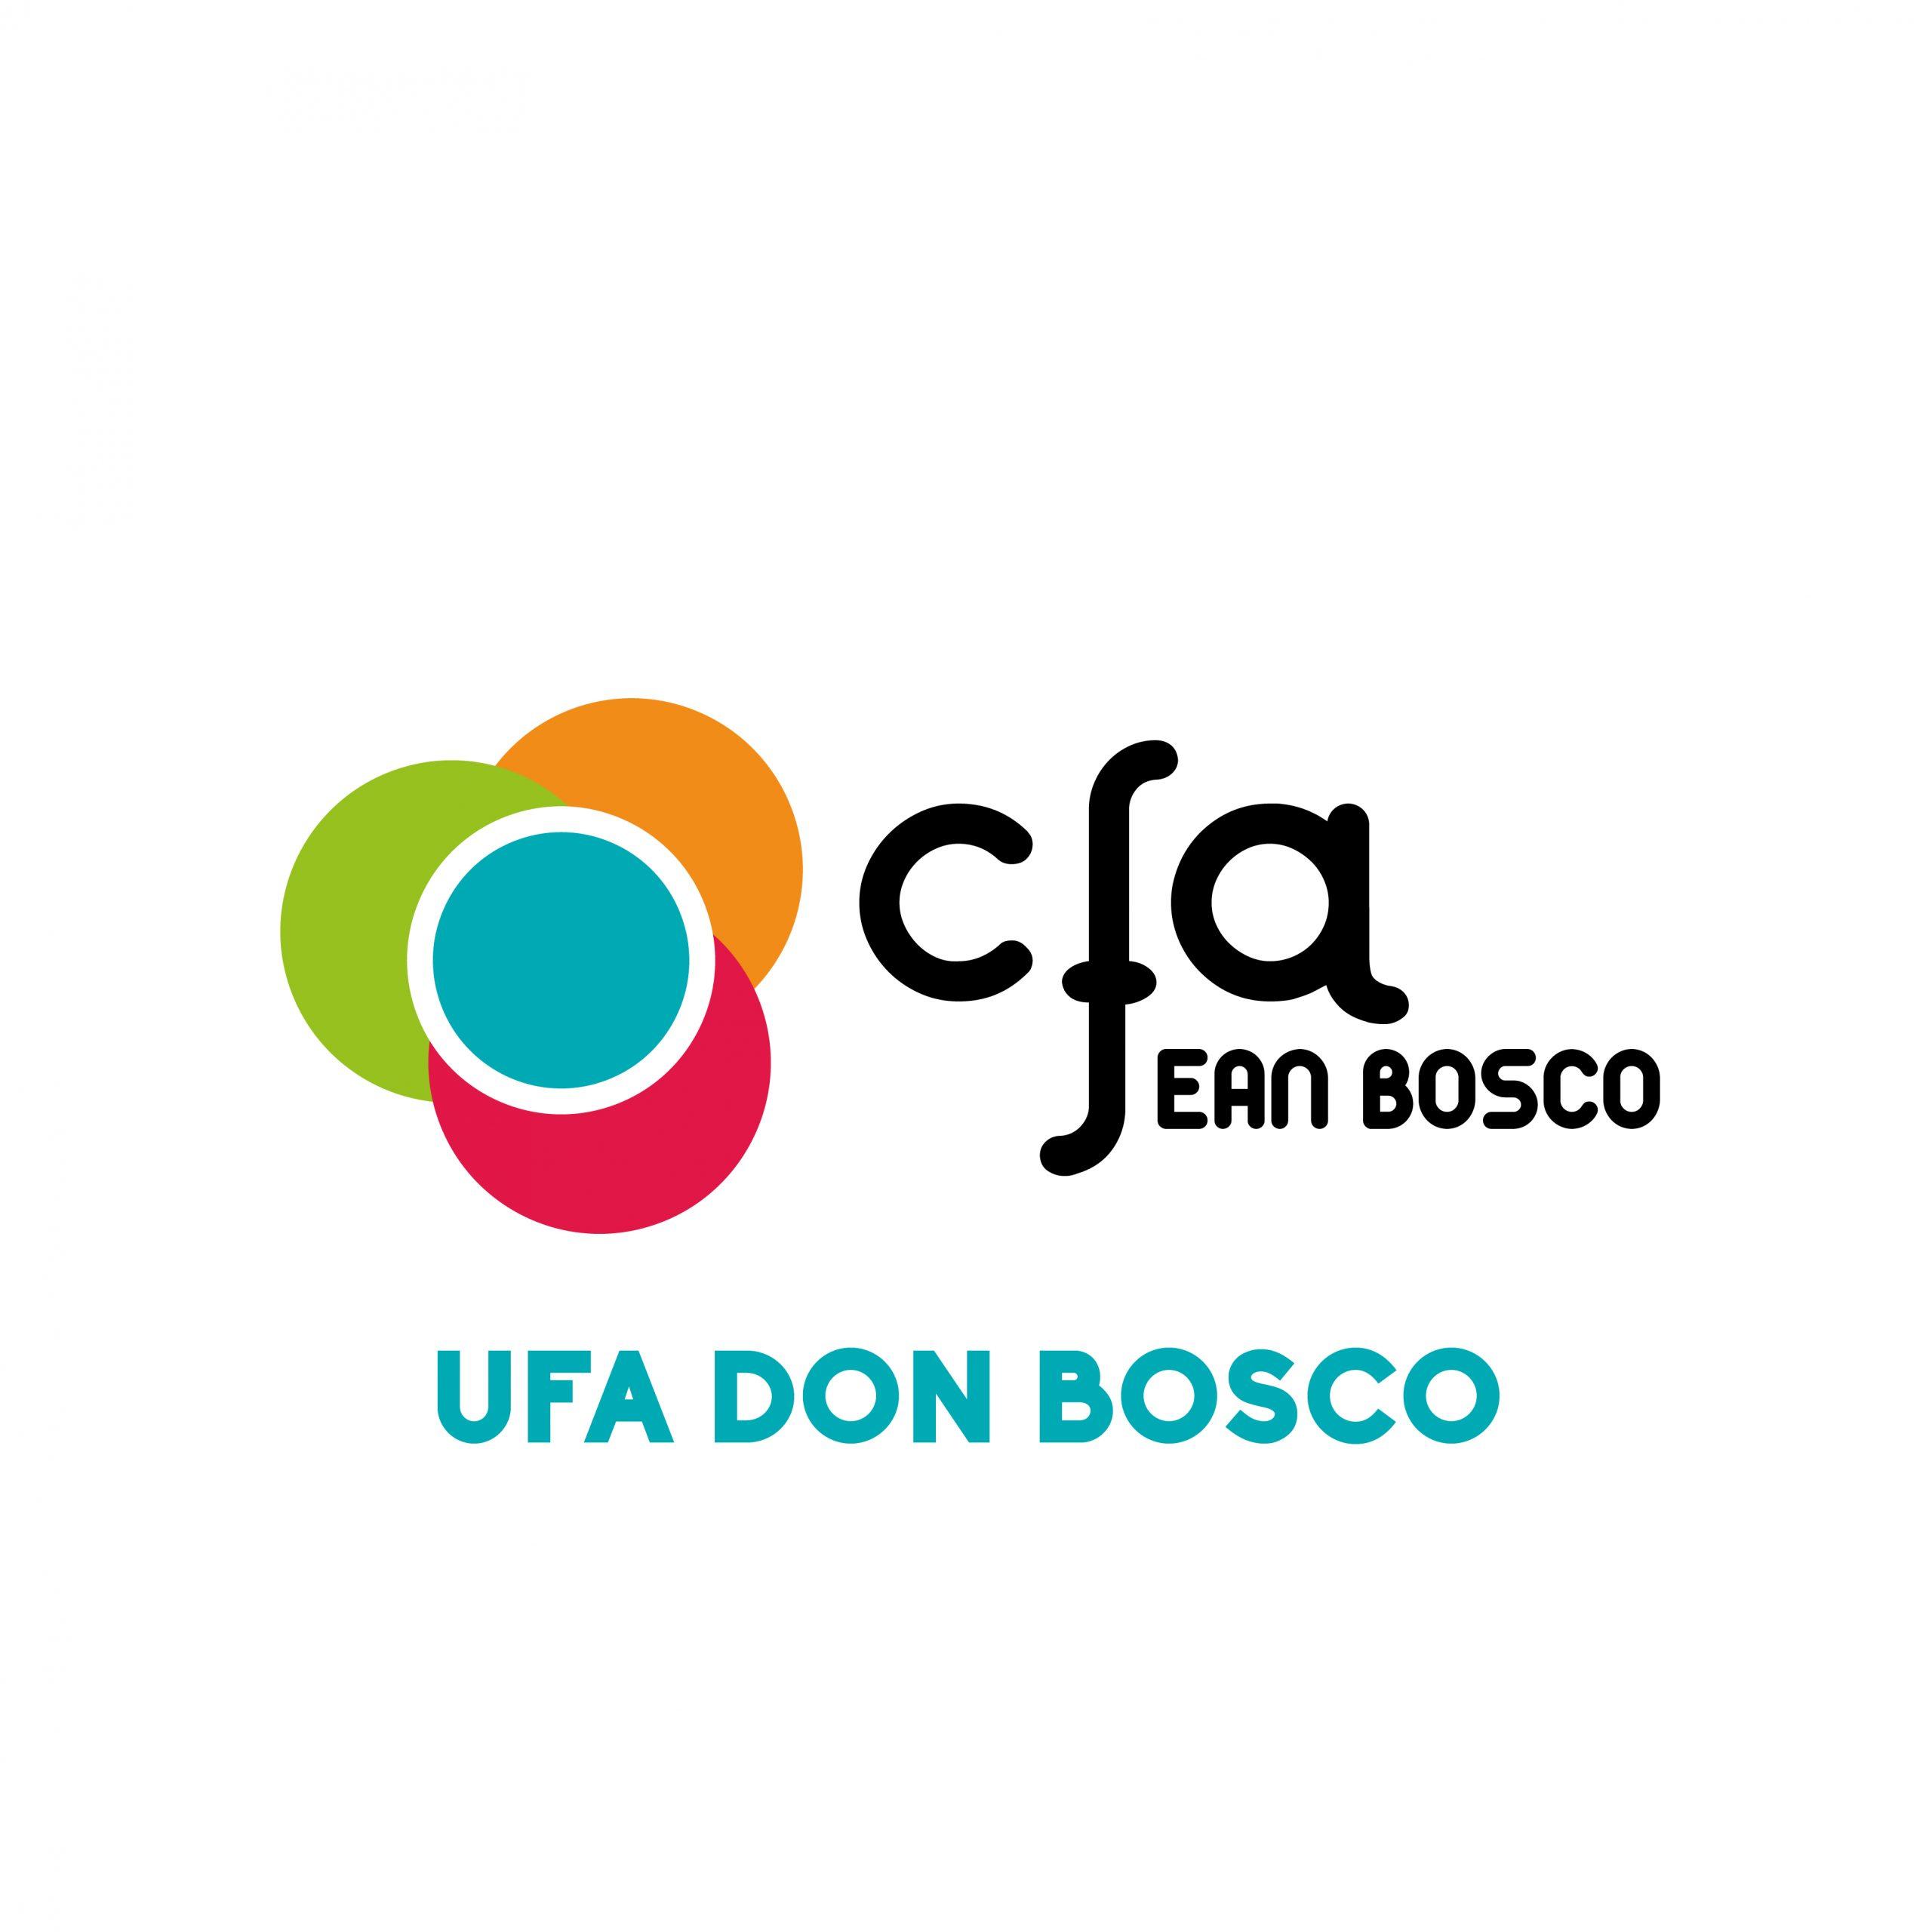 UFA DON BOSCO